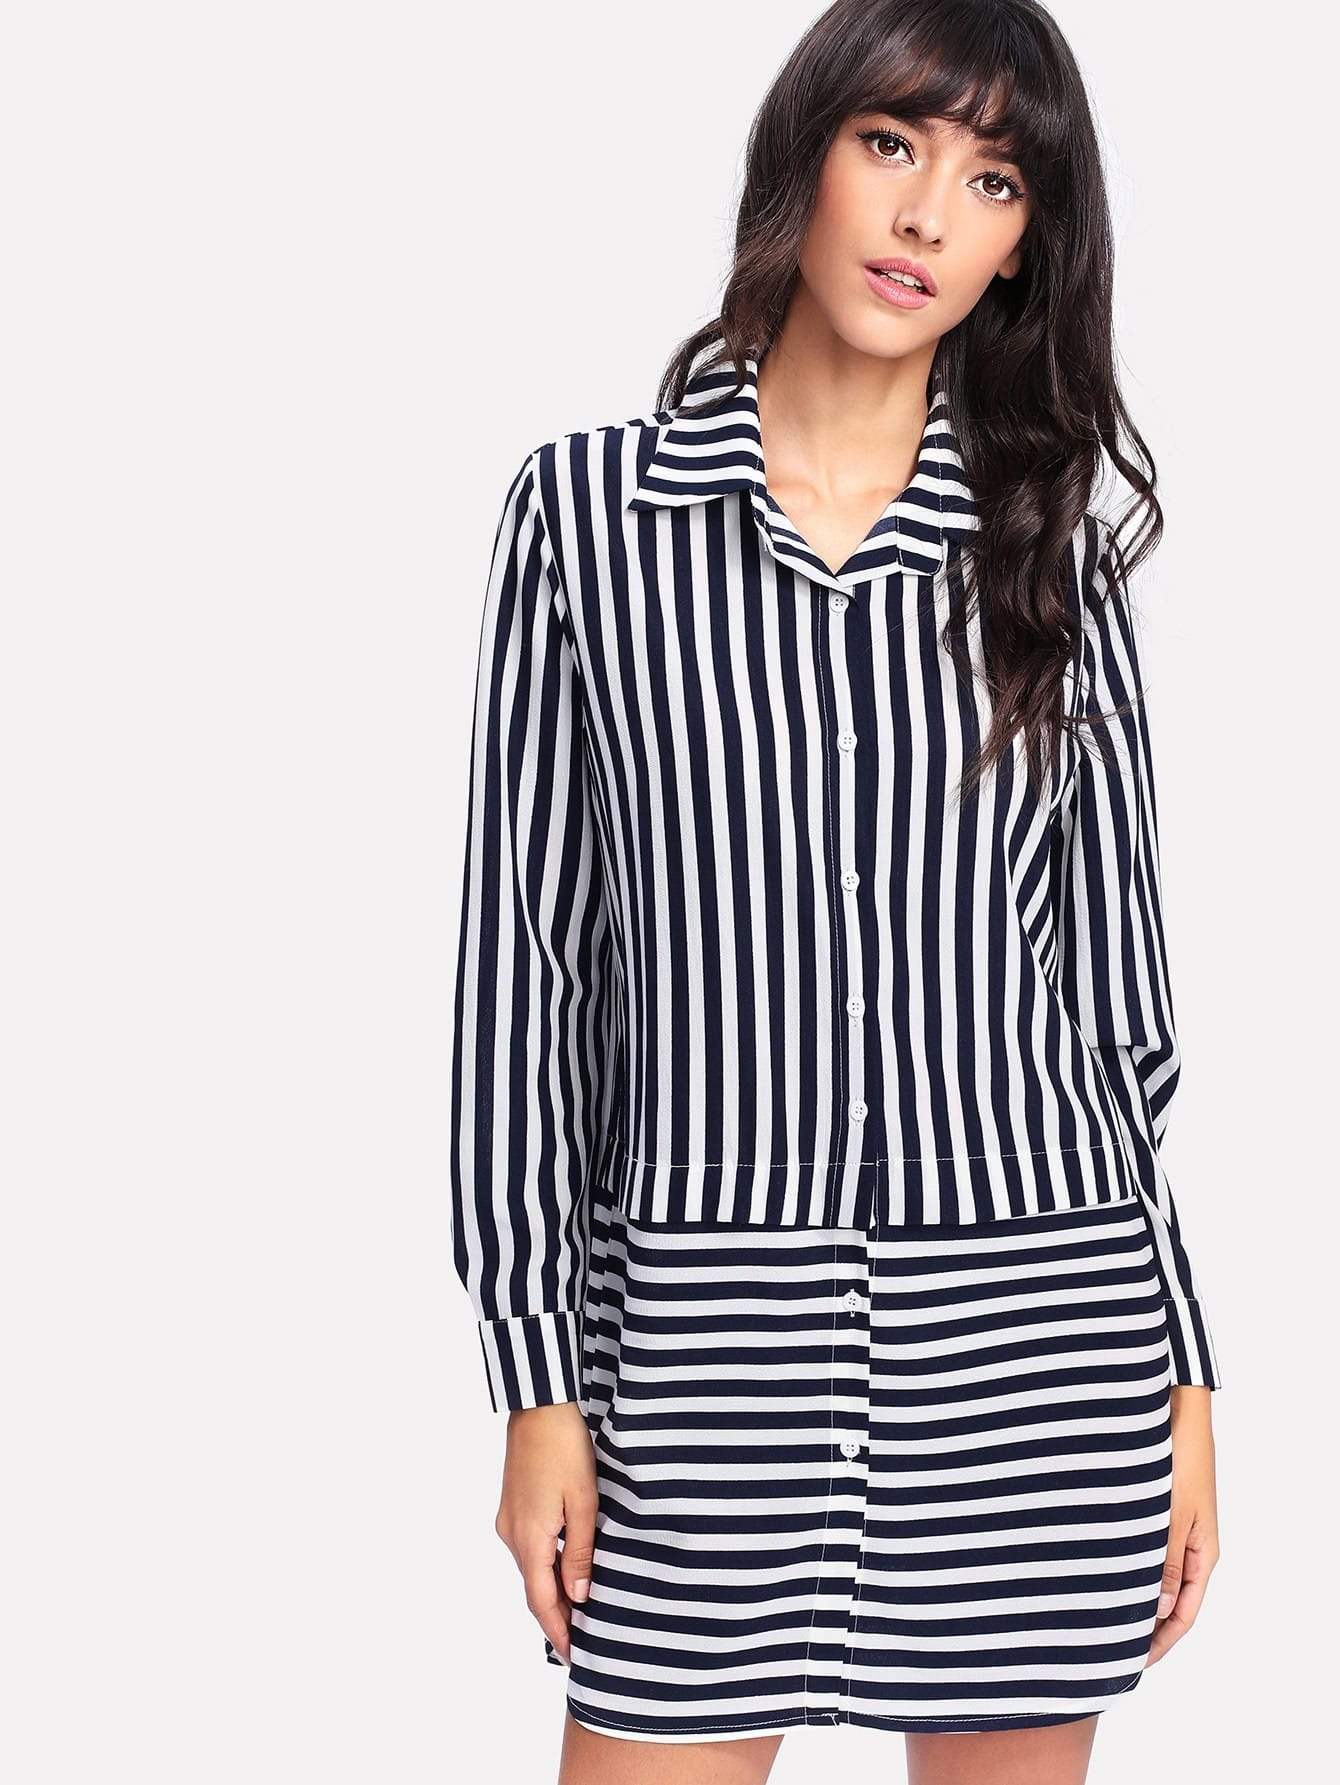 Contrast Striped Curved Hem Shirt Dress curved hem striped shirt dress